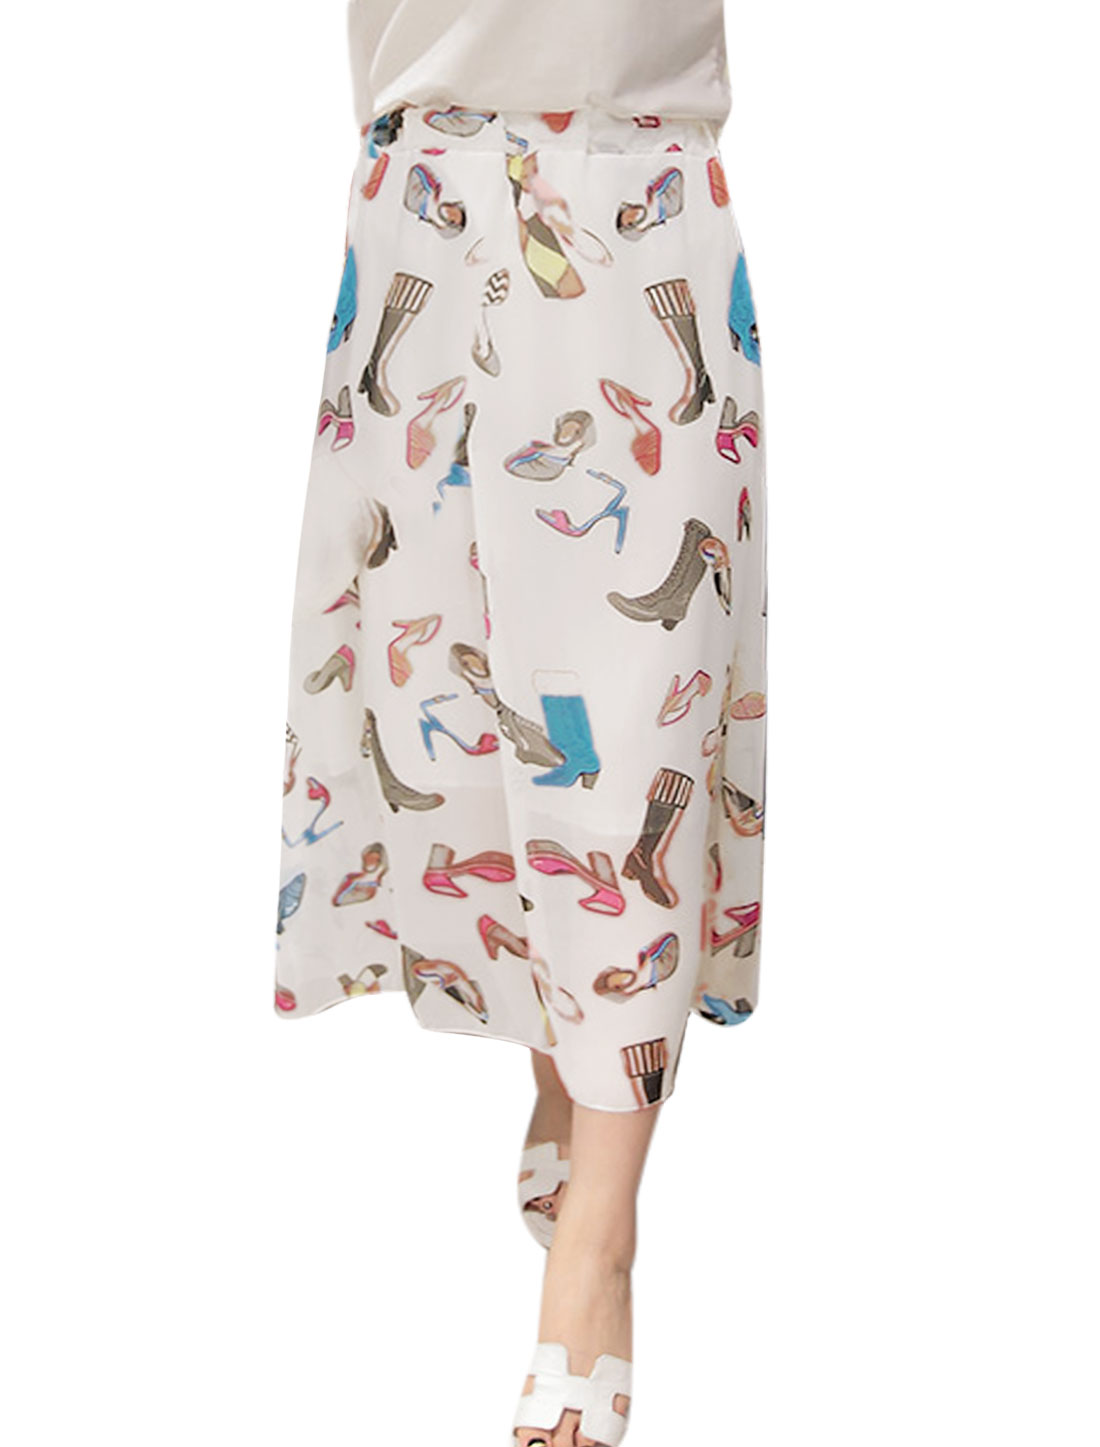 Women High-heel Shoes Prints Elastic Waist Chiffon Skirt White XS